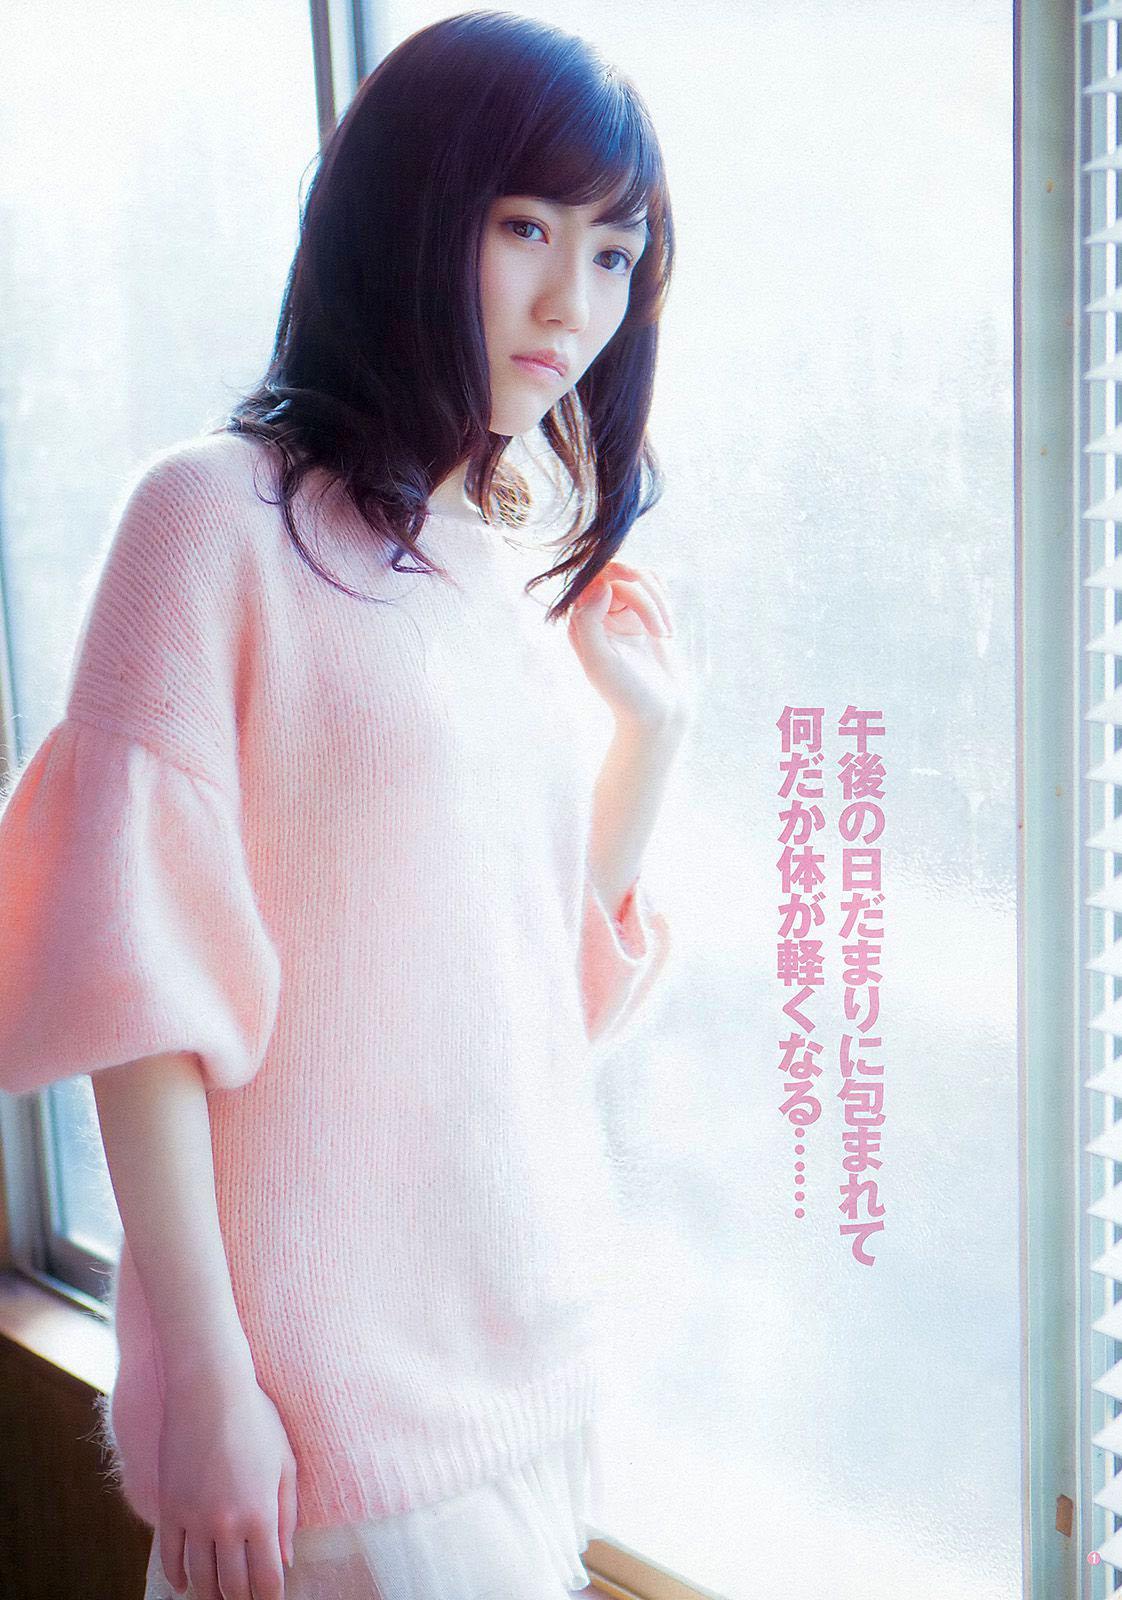 MWatanabe Young Jump 121206 02.jpg